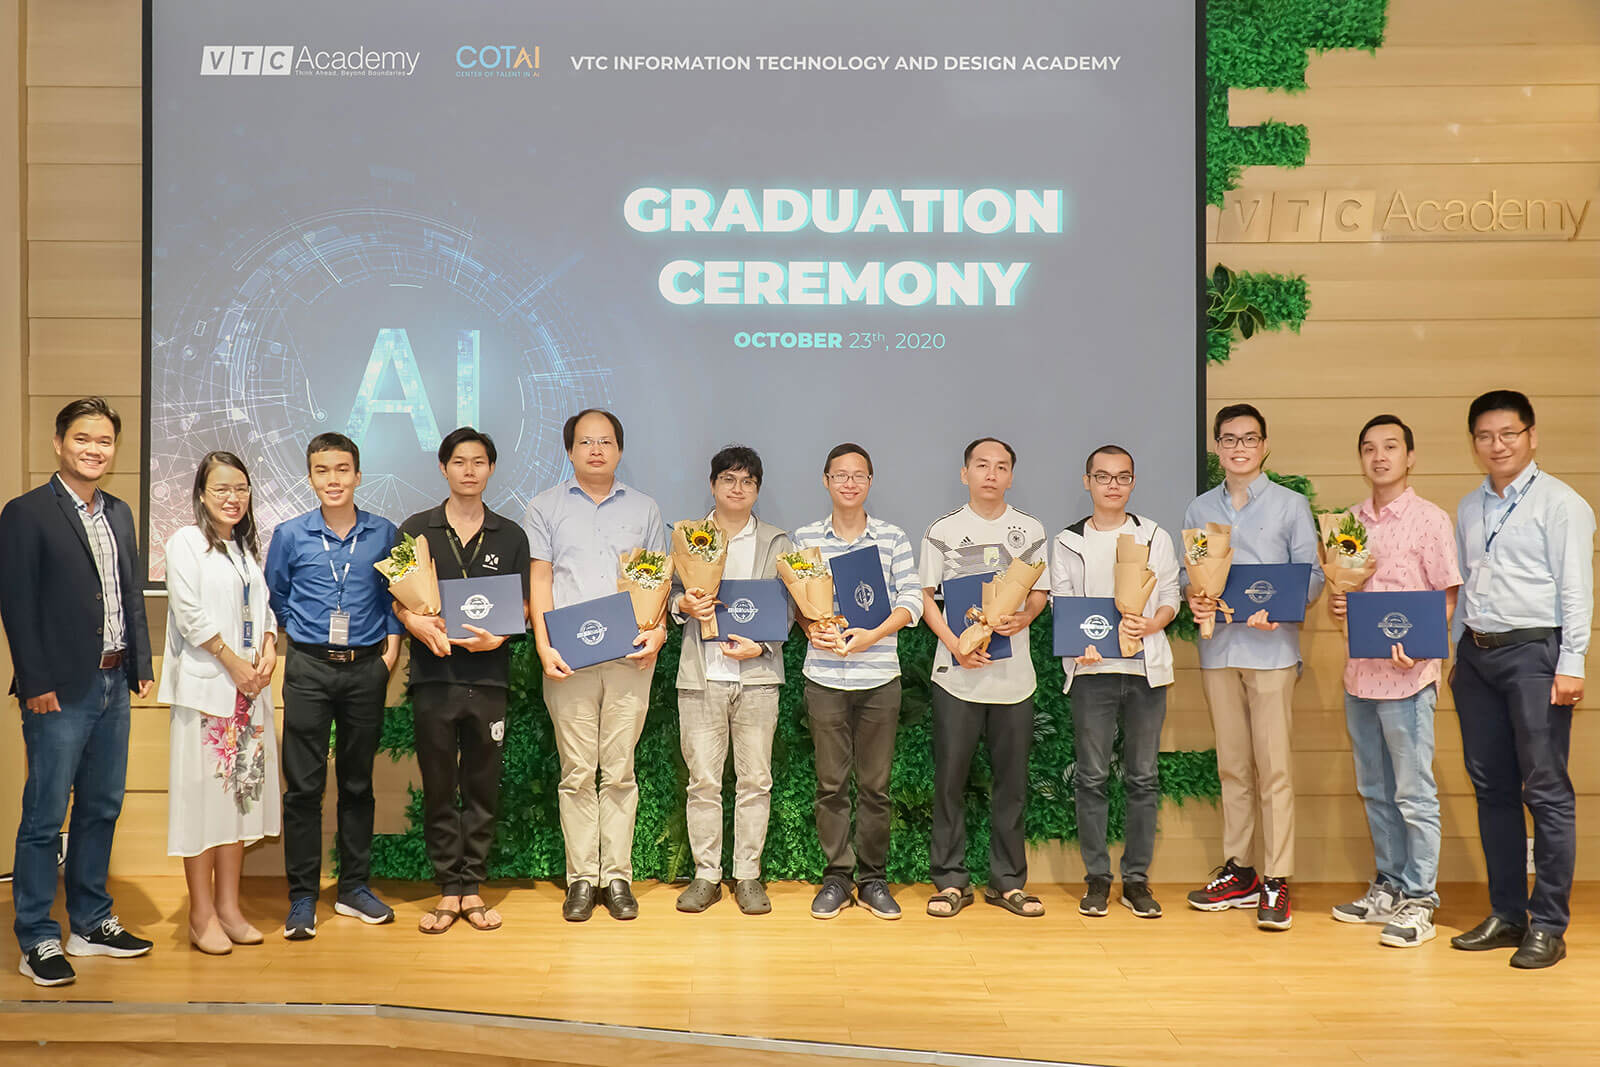 VTC Academy tổ chức lễ tốt nghiệp lớp AI Practitioner và lớp AI Specialist tại TP.HCM